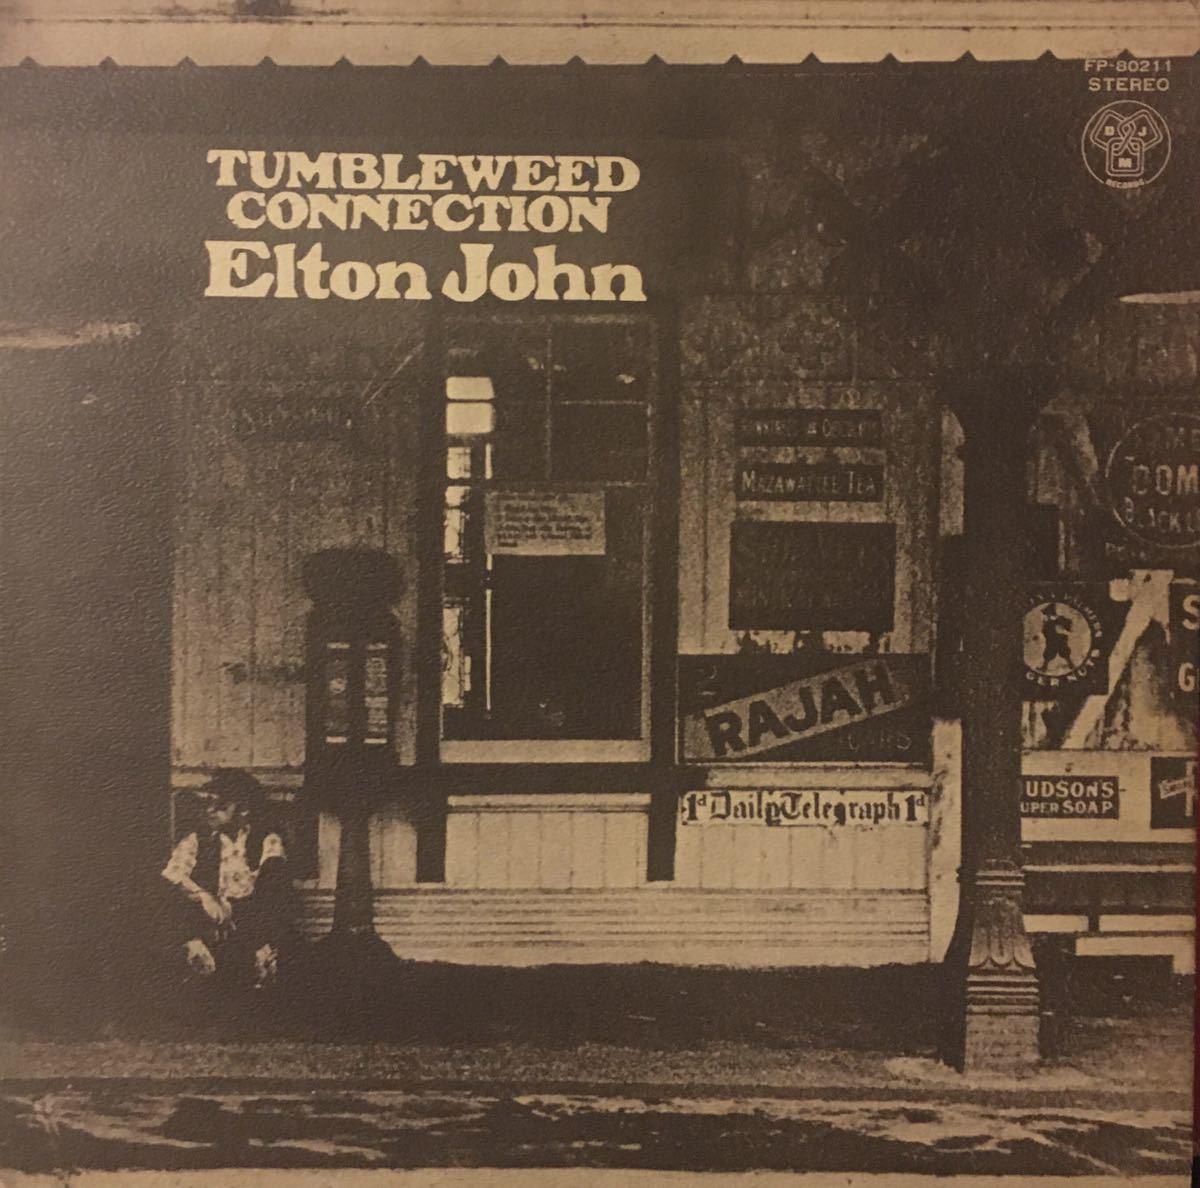 Elton John / Tumbleweed Connection ロック名盤 廃盤 エルトン・ジョン レコード LP 日本盤 再発 クリアレッド_画像1